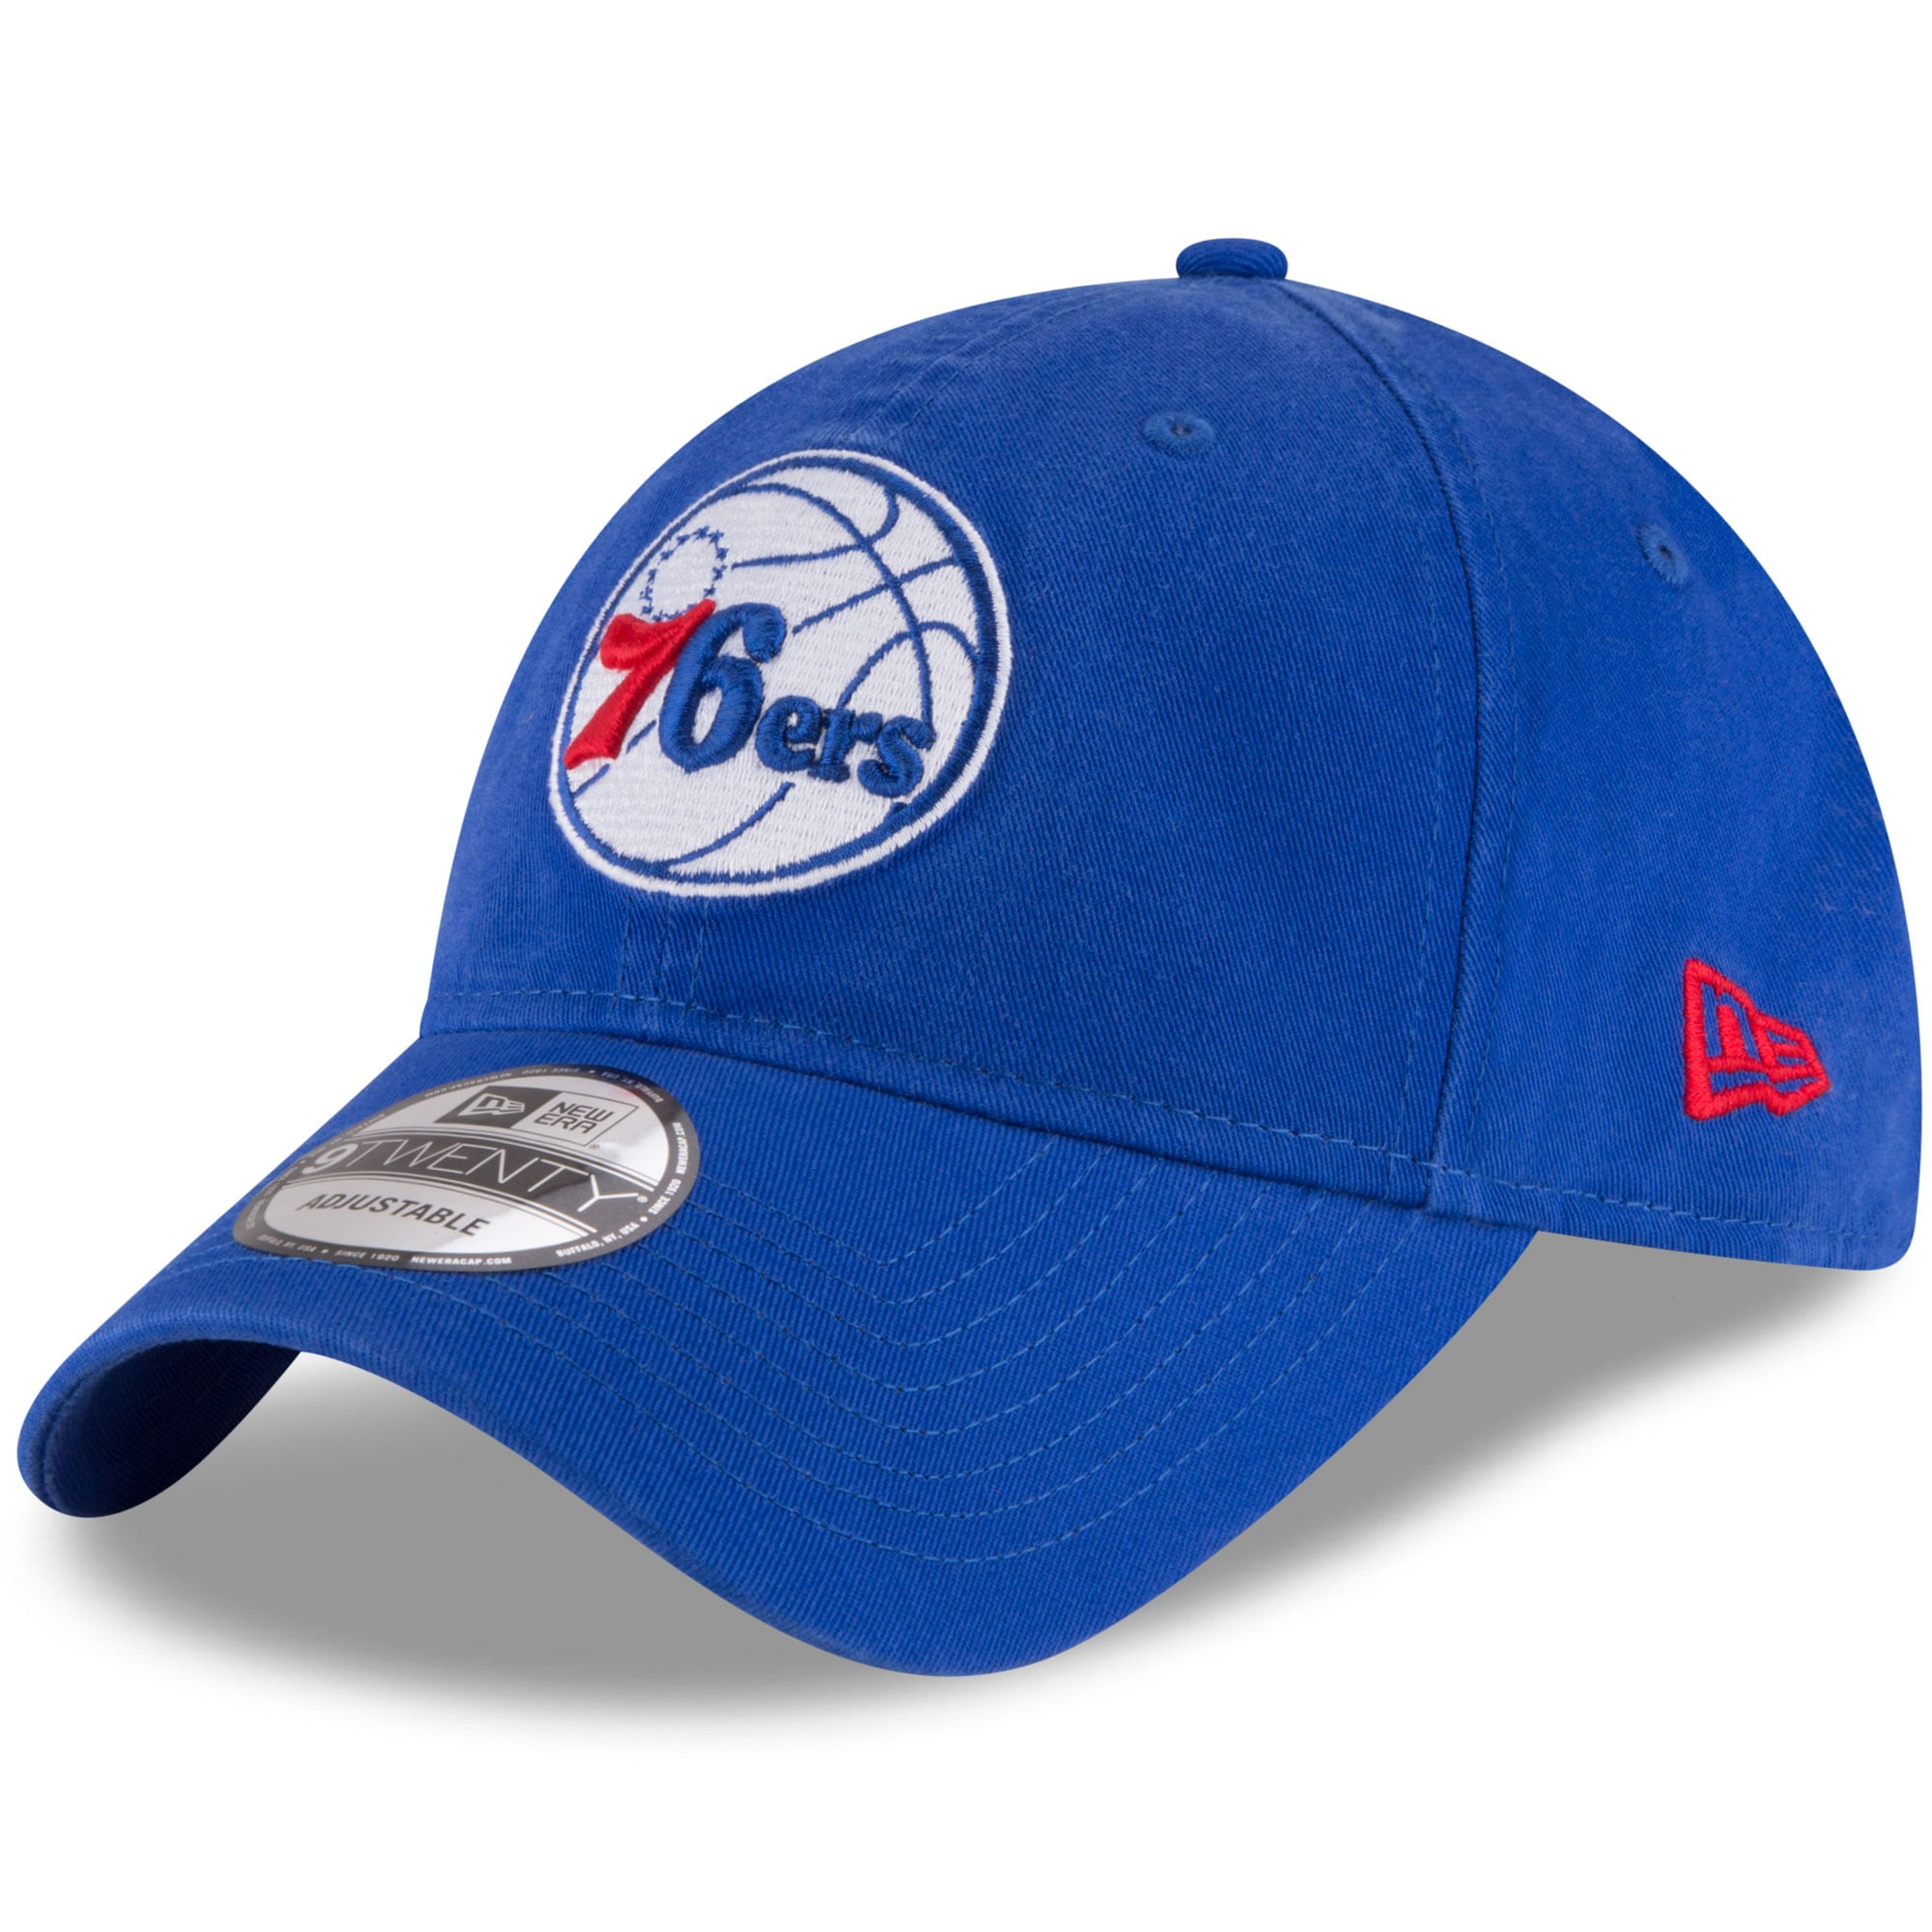 Philadelphia 76ers New Era Official Team Color 9TWENTY Adjustable Hat - Royal